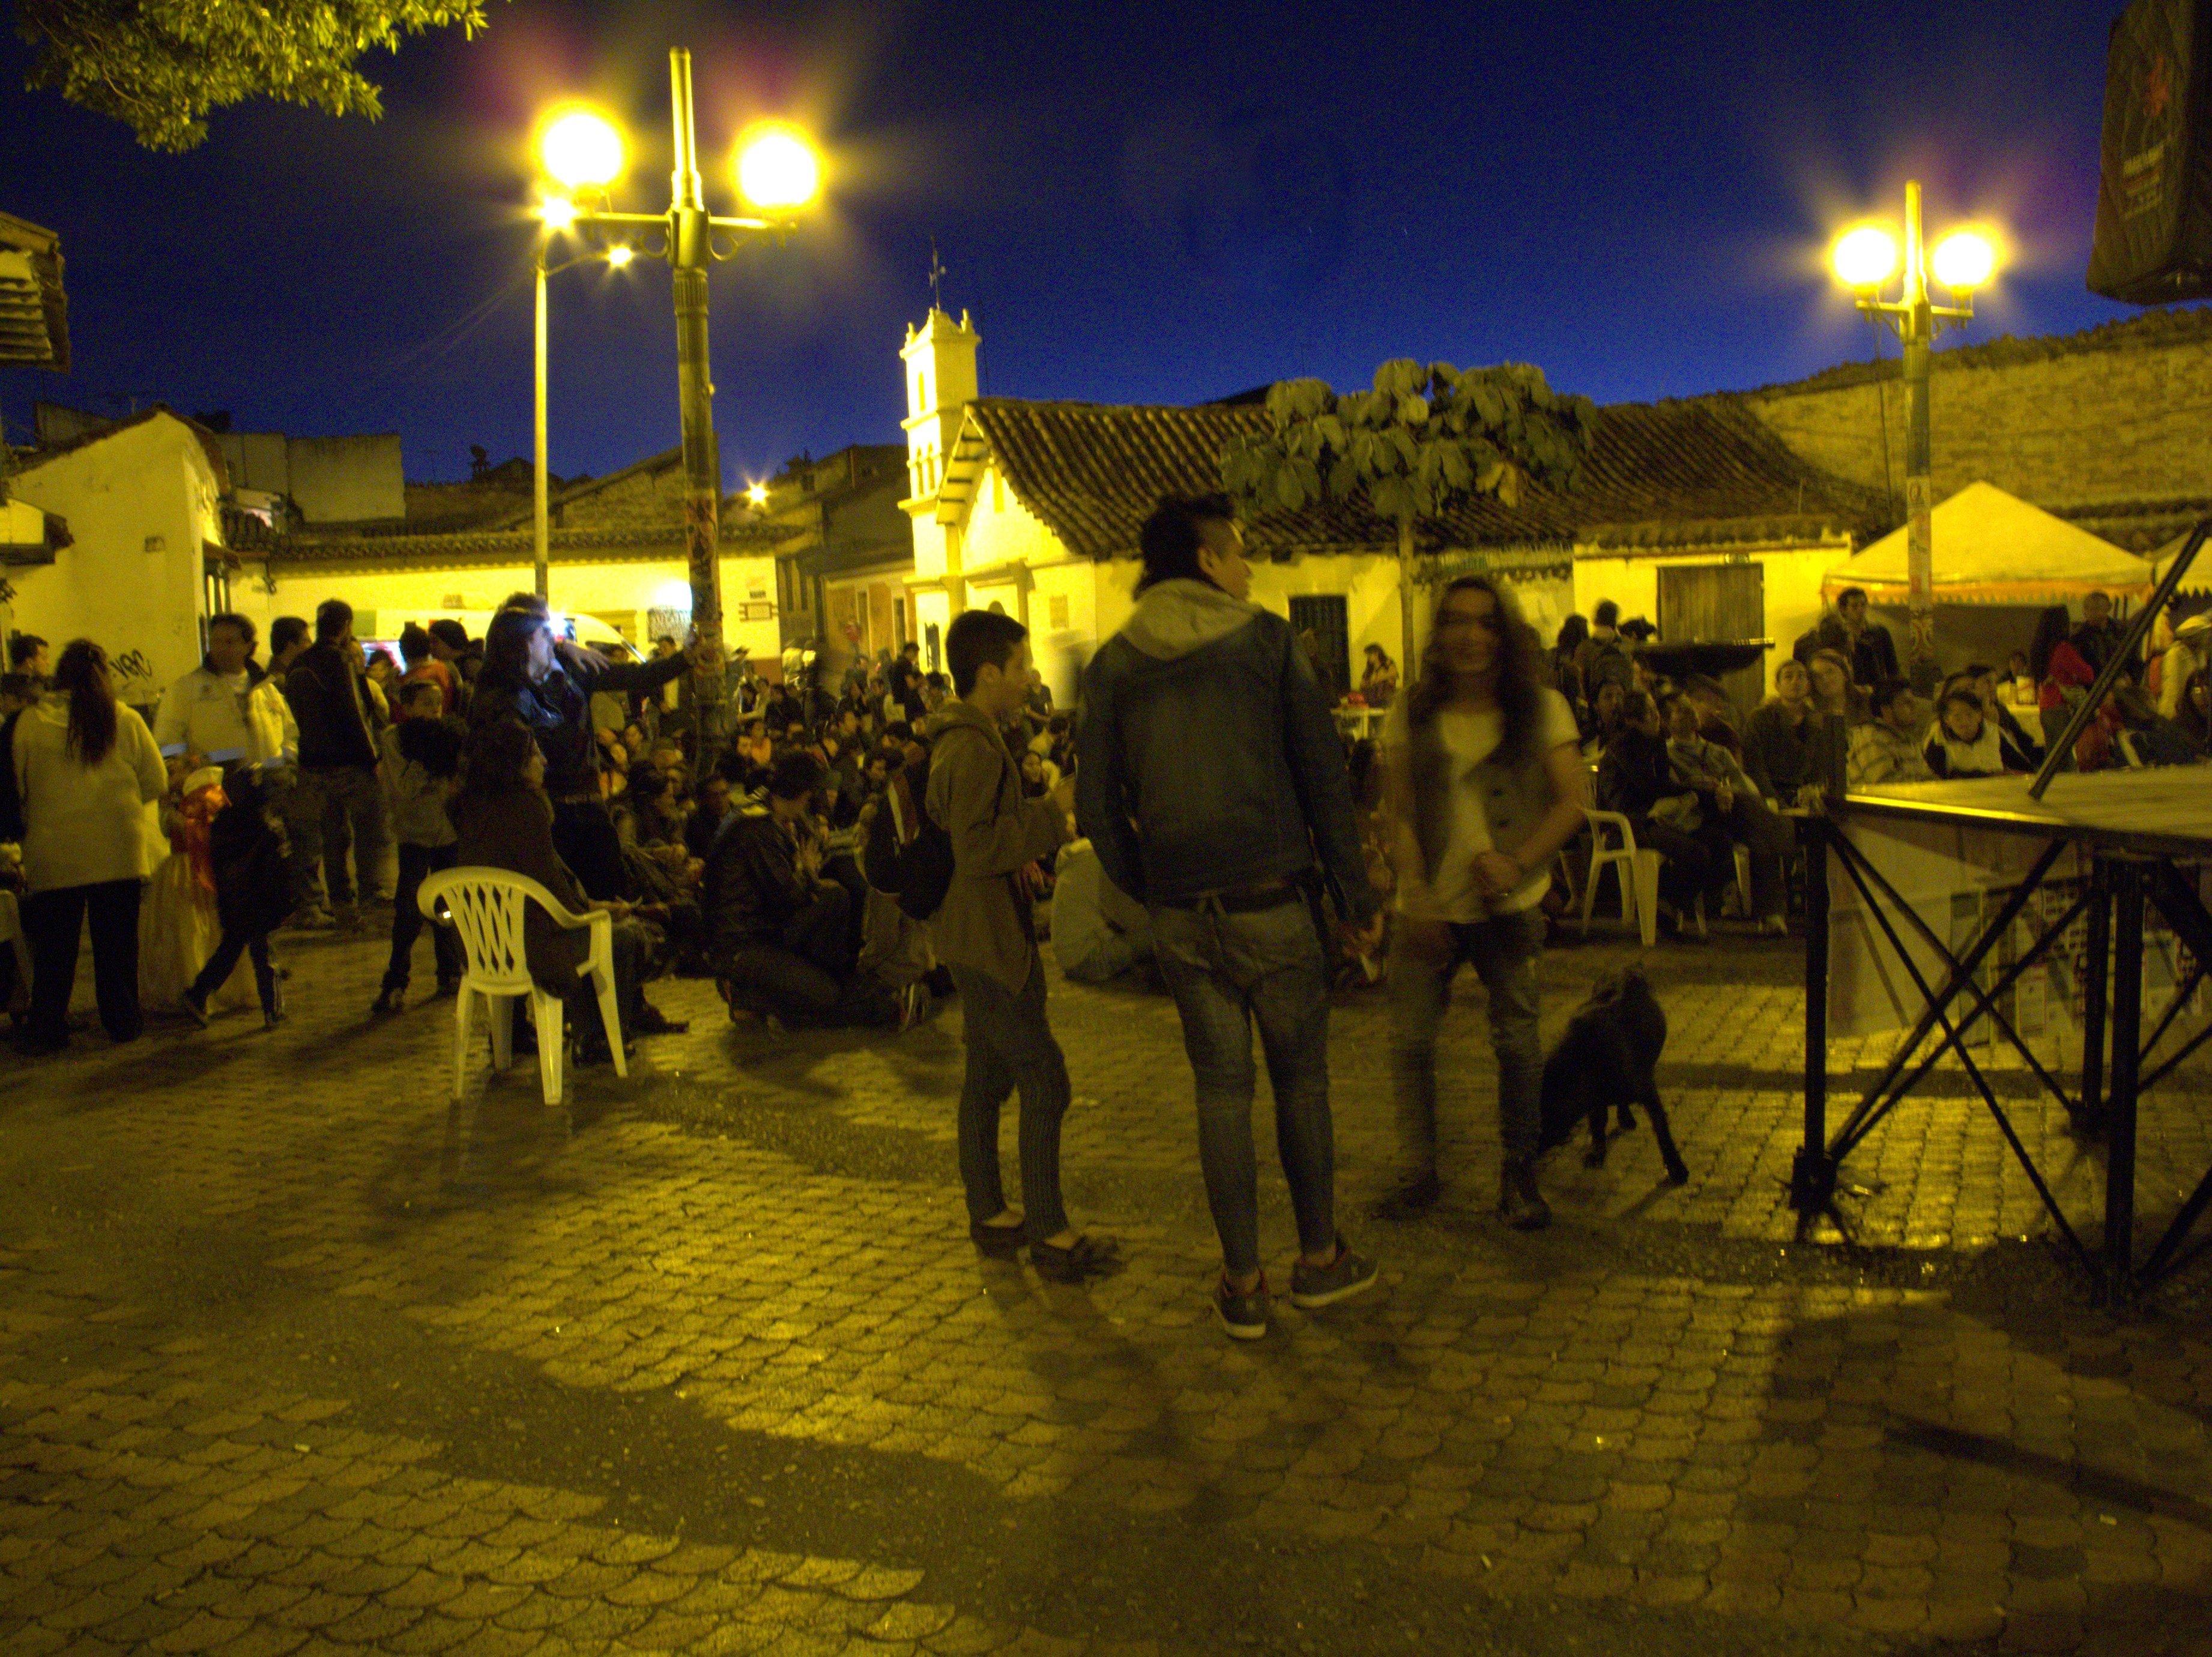 A music festival in Bogota's Chorro de Quevedo